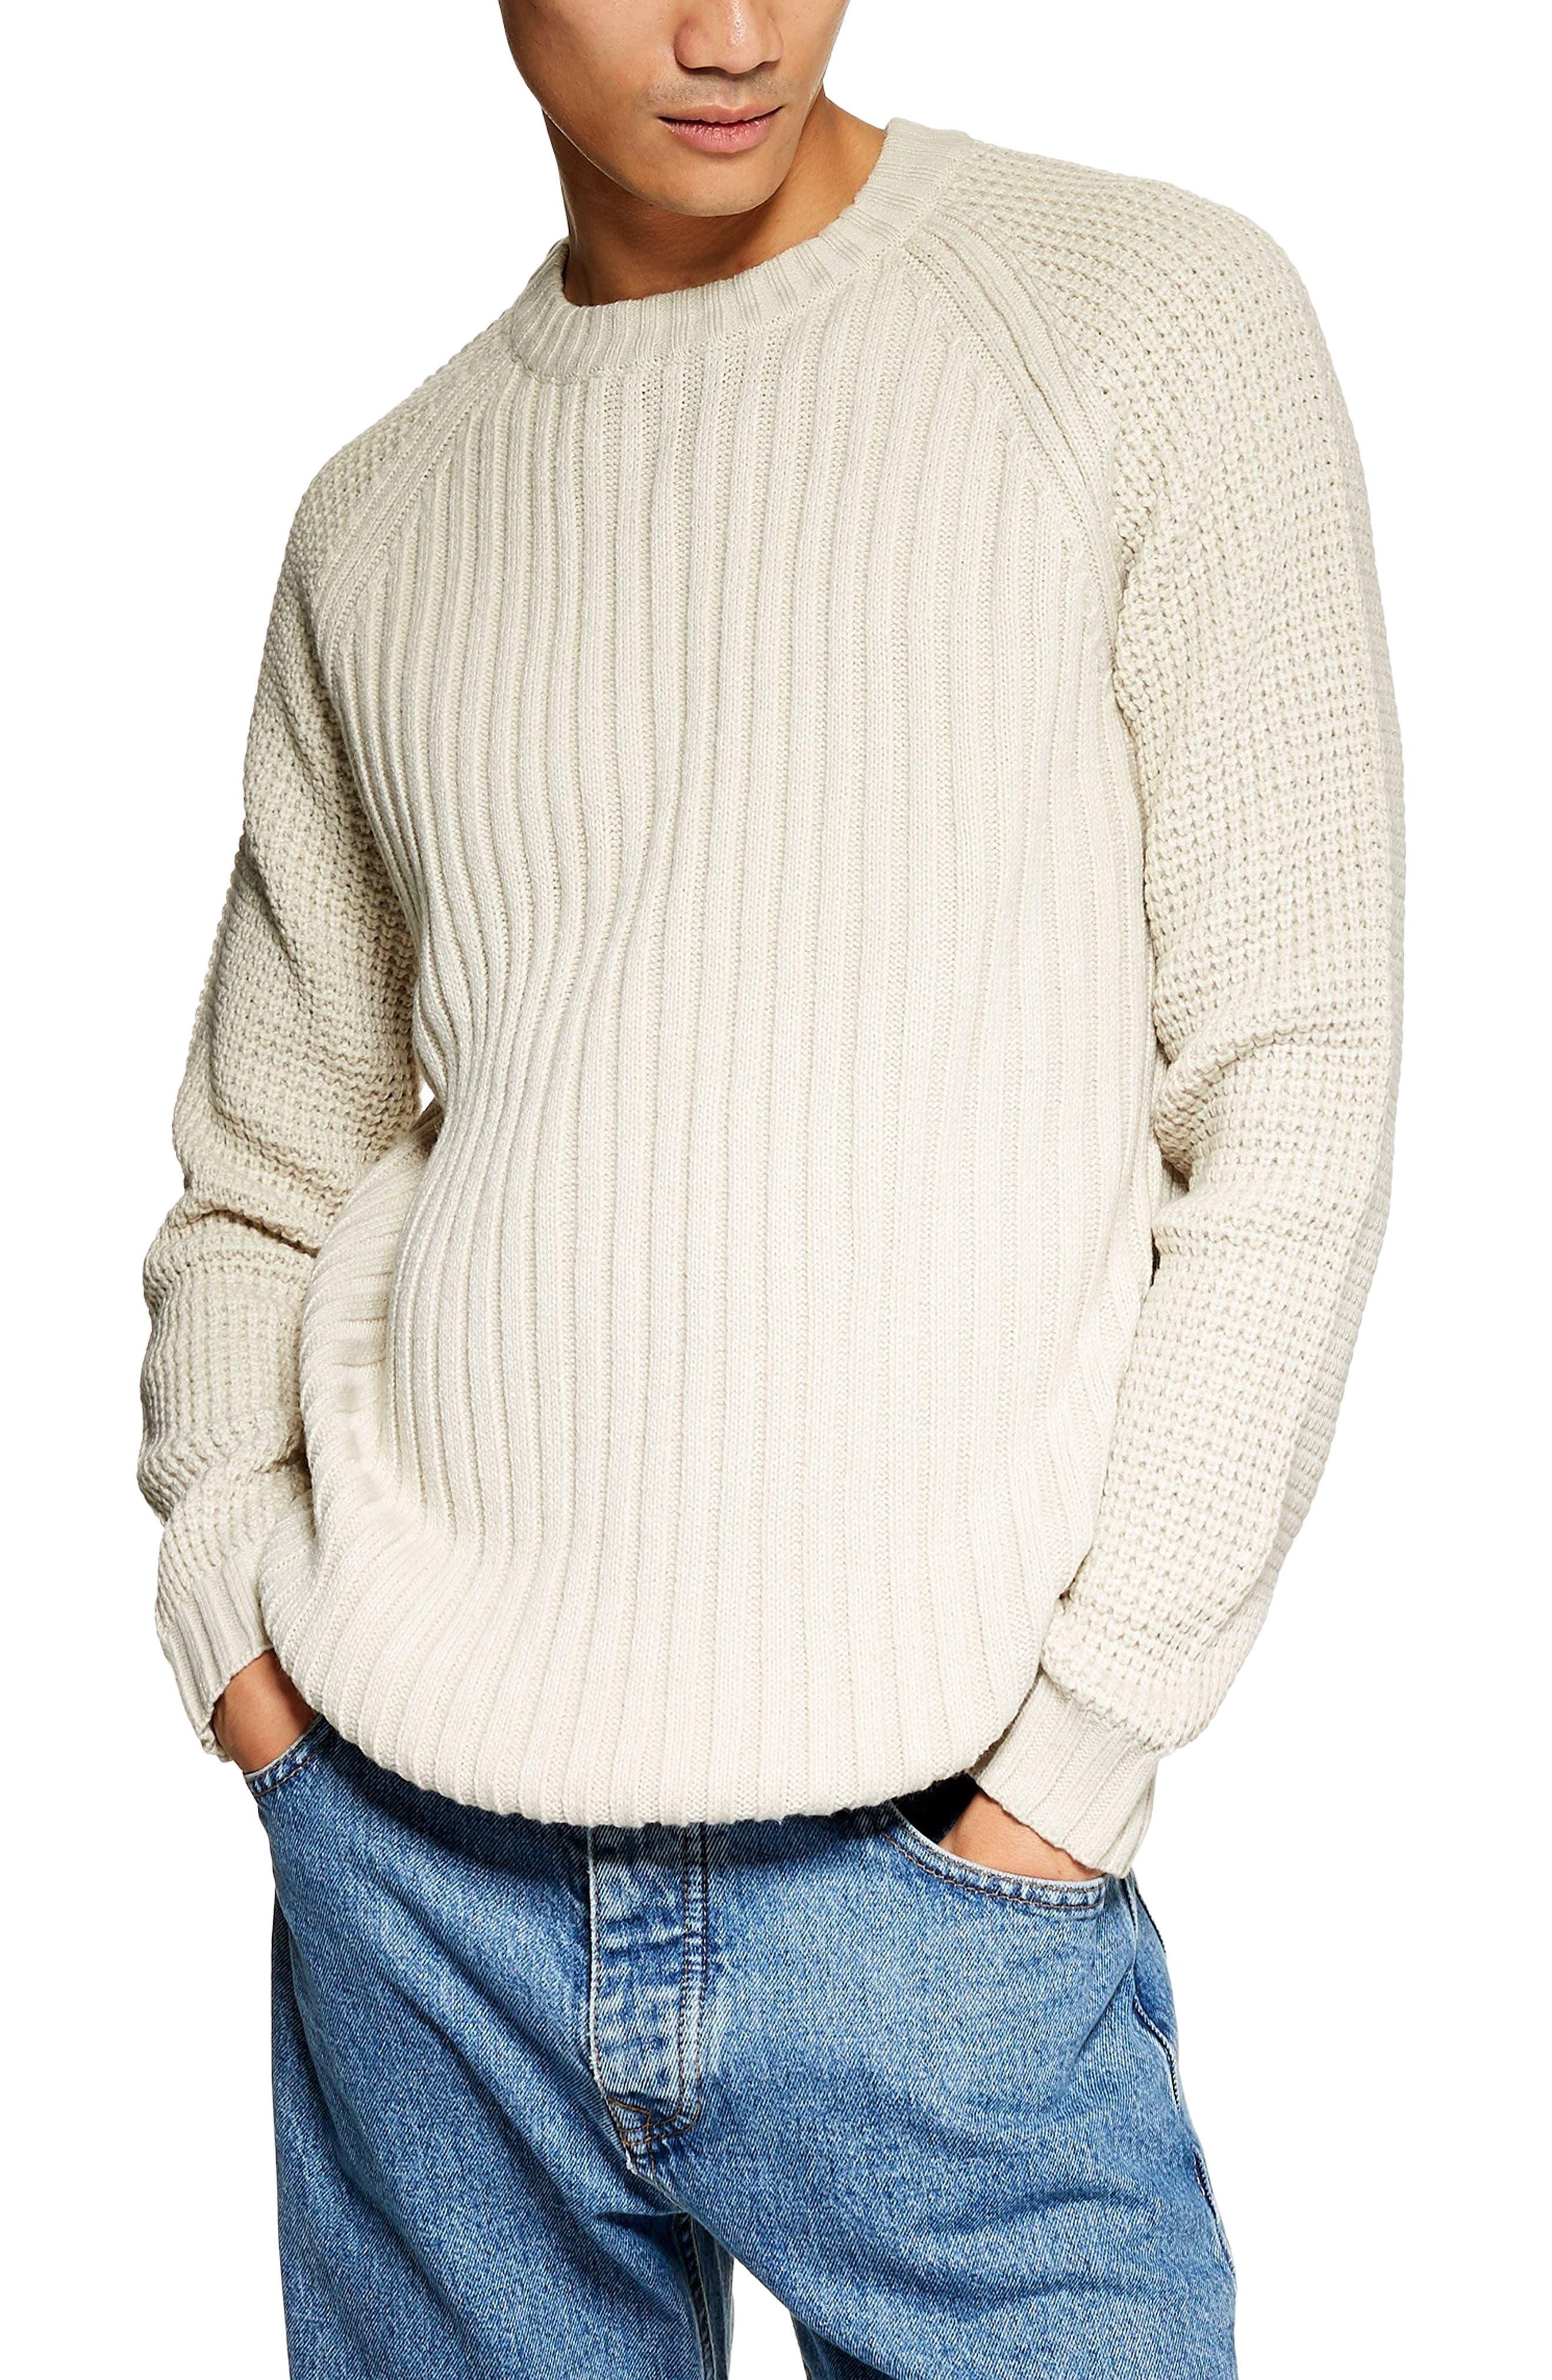 Mixed Stitch Classic Crewneck Sweater,                         Main,                         color, STONE